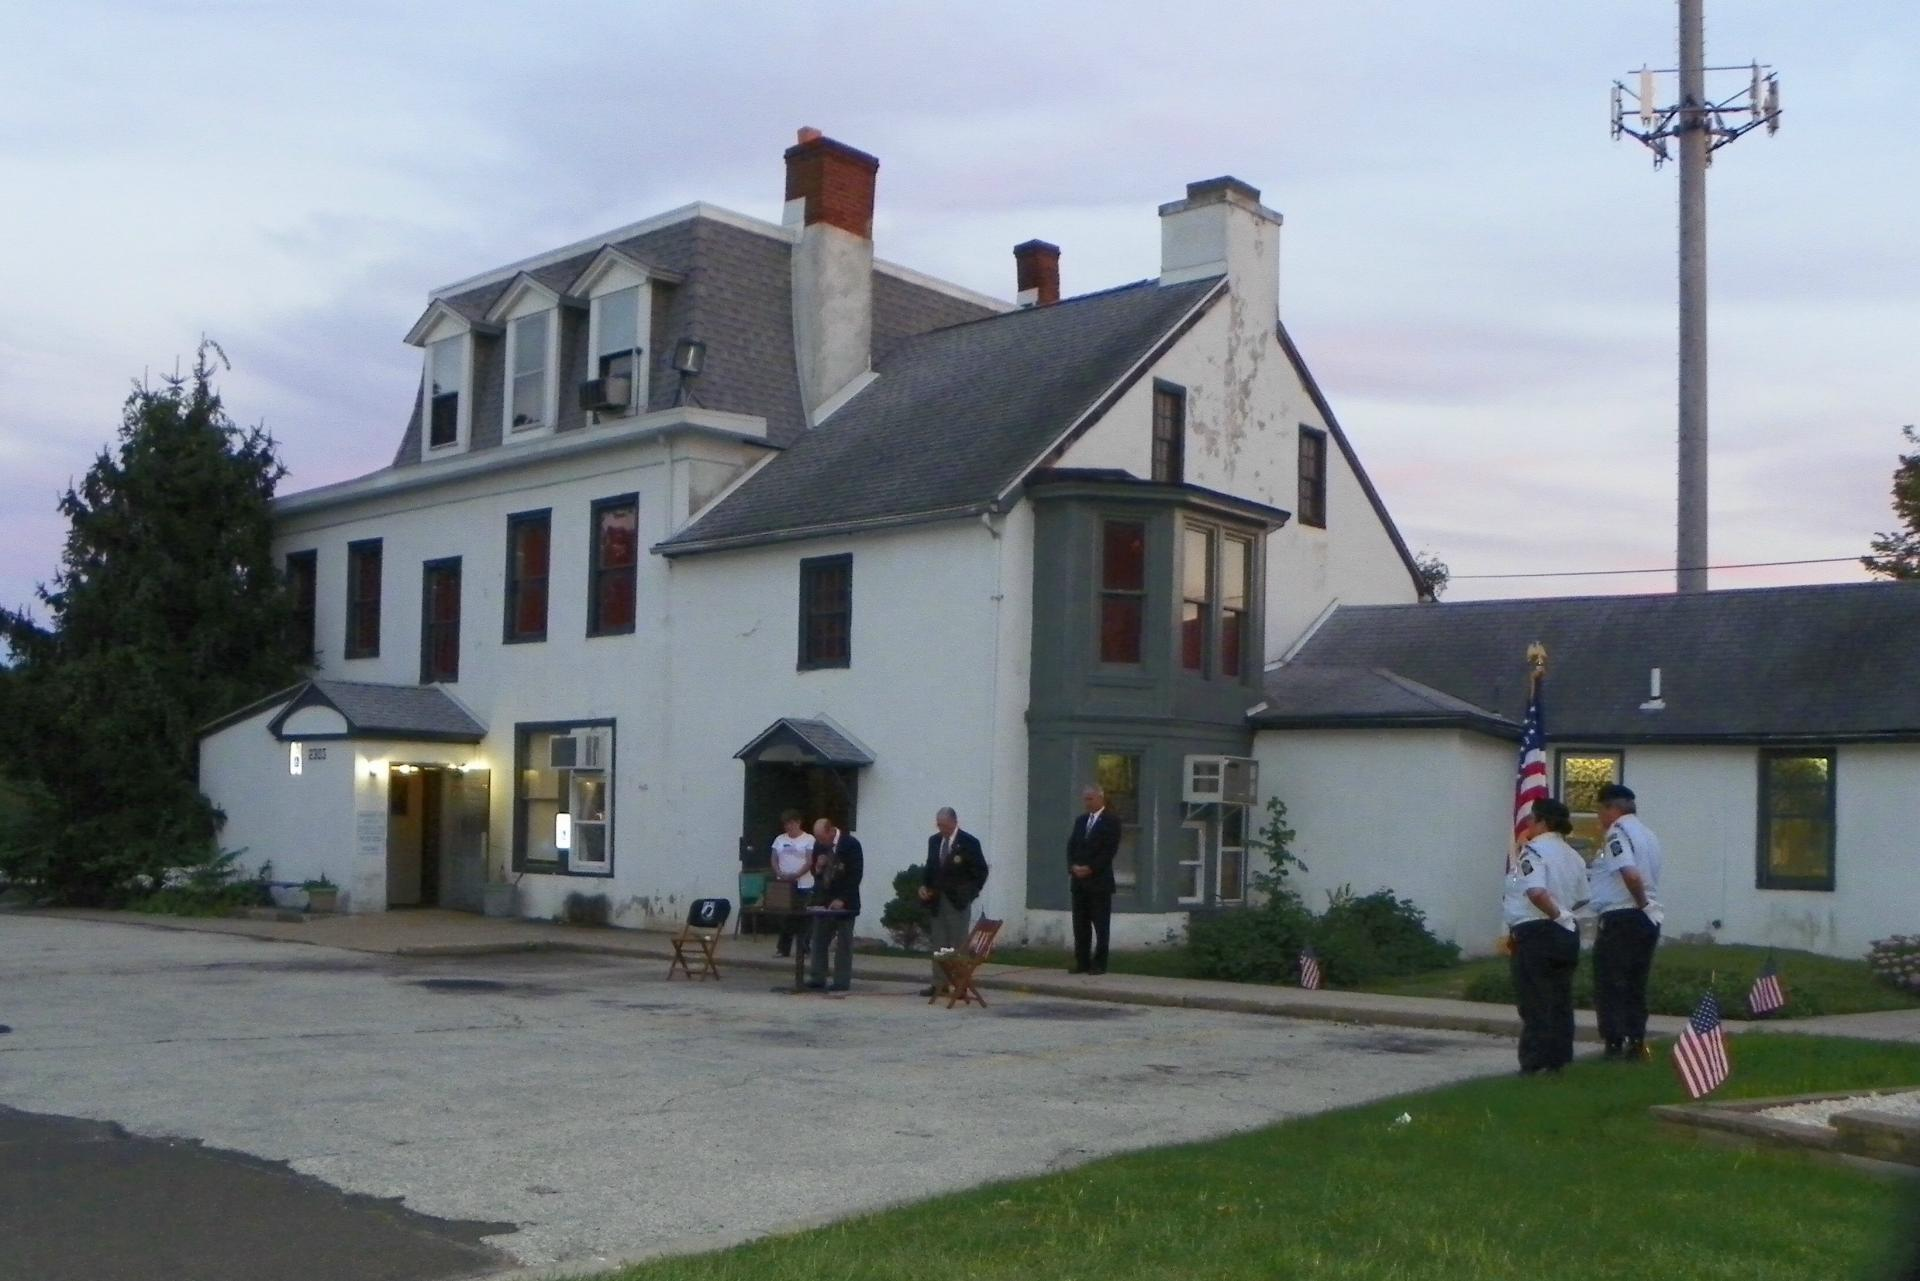 Post 308 Willow Grove, PA 19090-1707, Pennsylvania